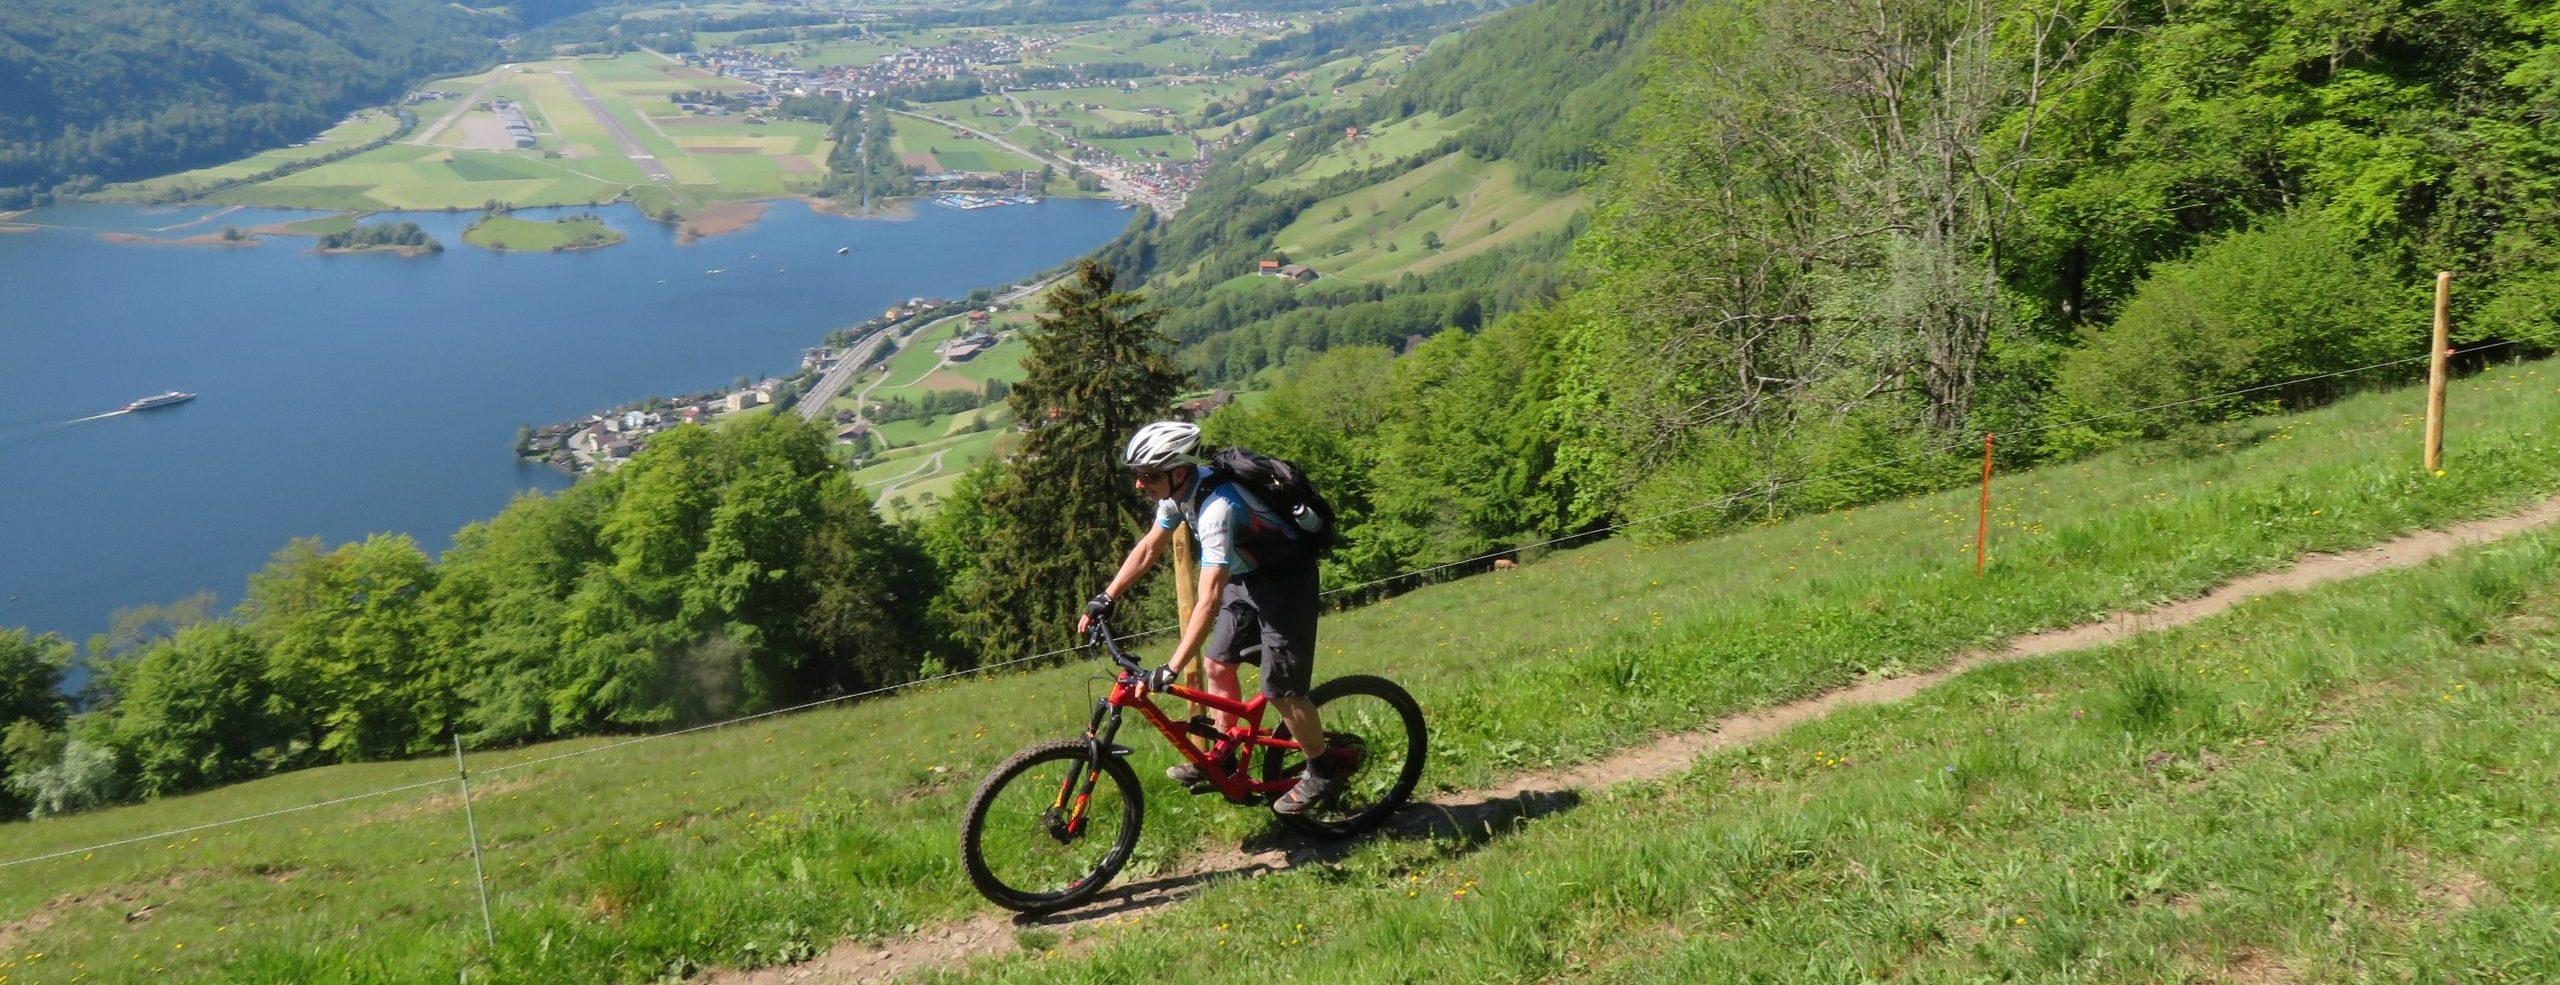 Biketour um Alpnach